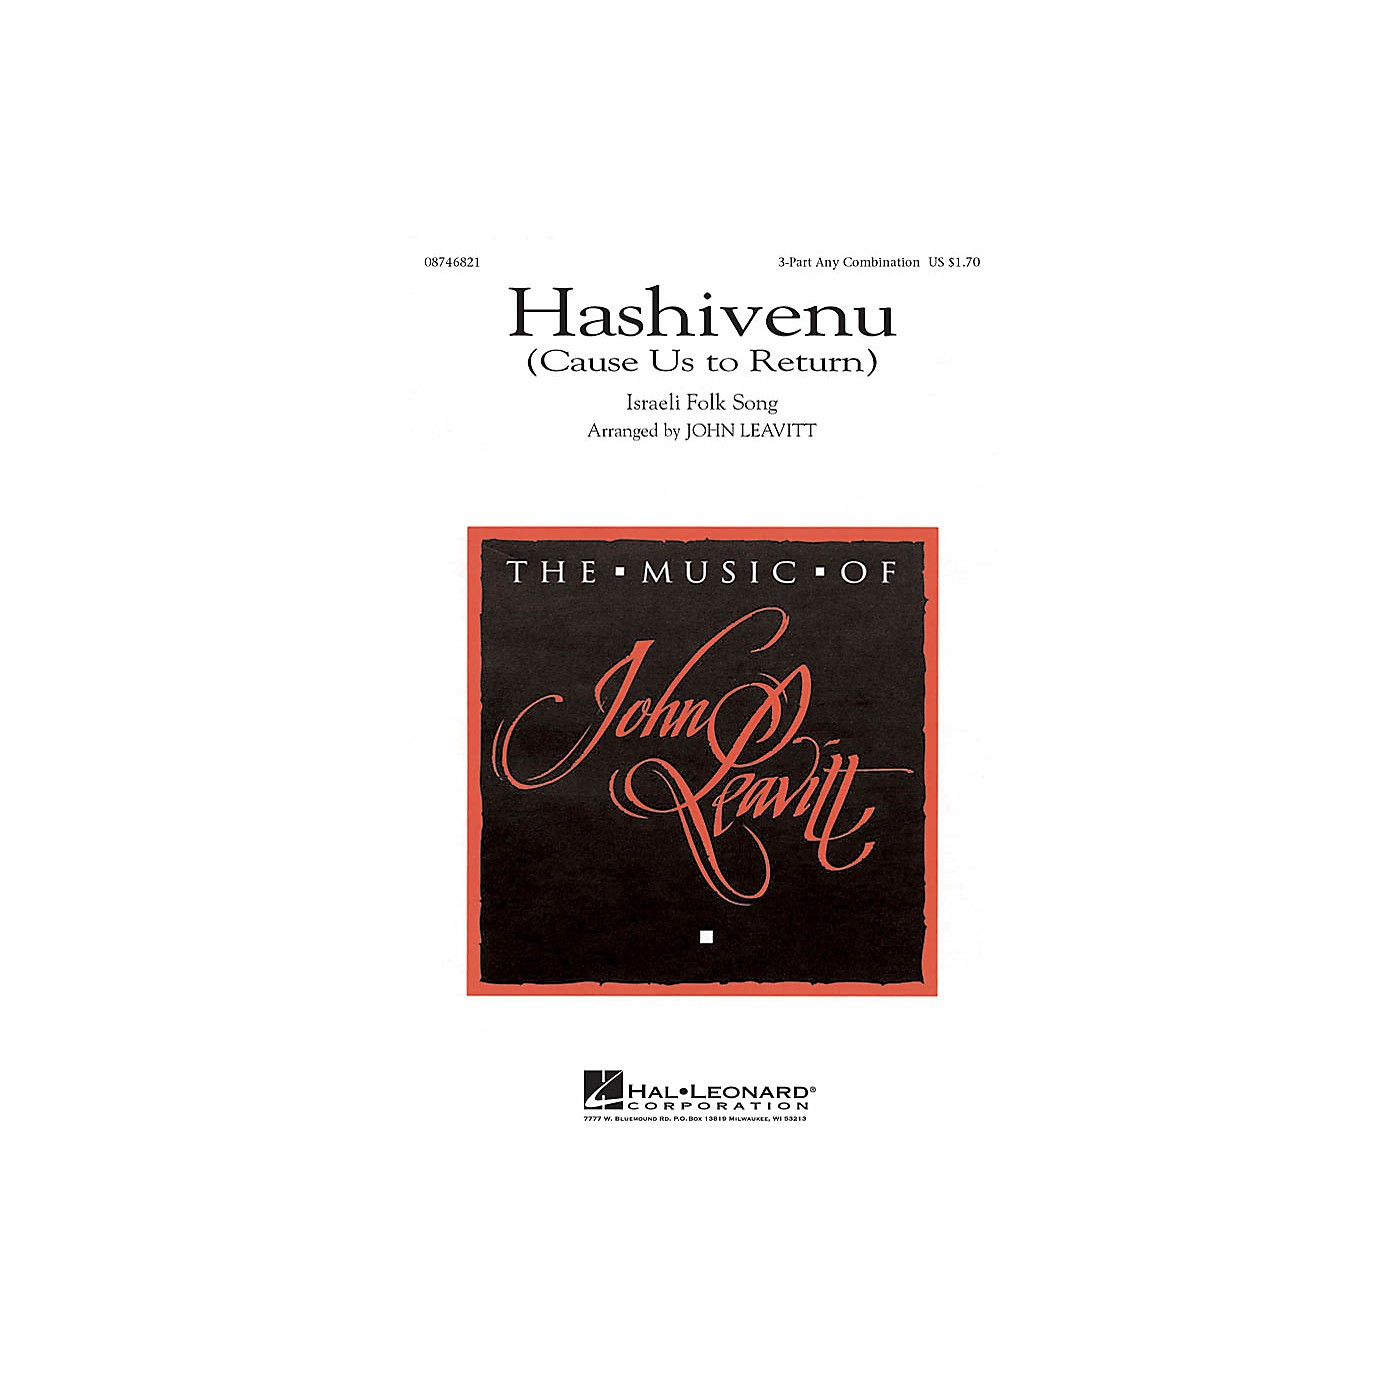 Hal Leonard Hashivenu (Cause Us to Return) 3 Part Any Combination arranged by John Leavitt thumbnail